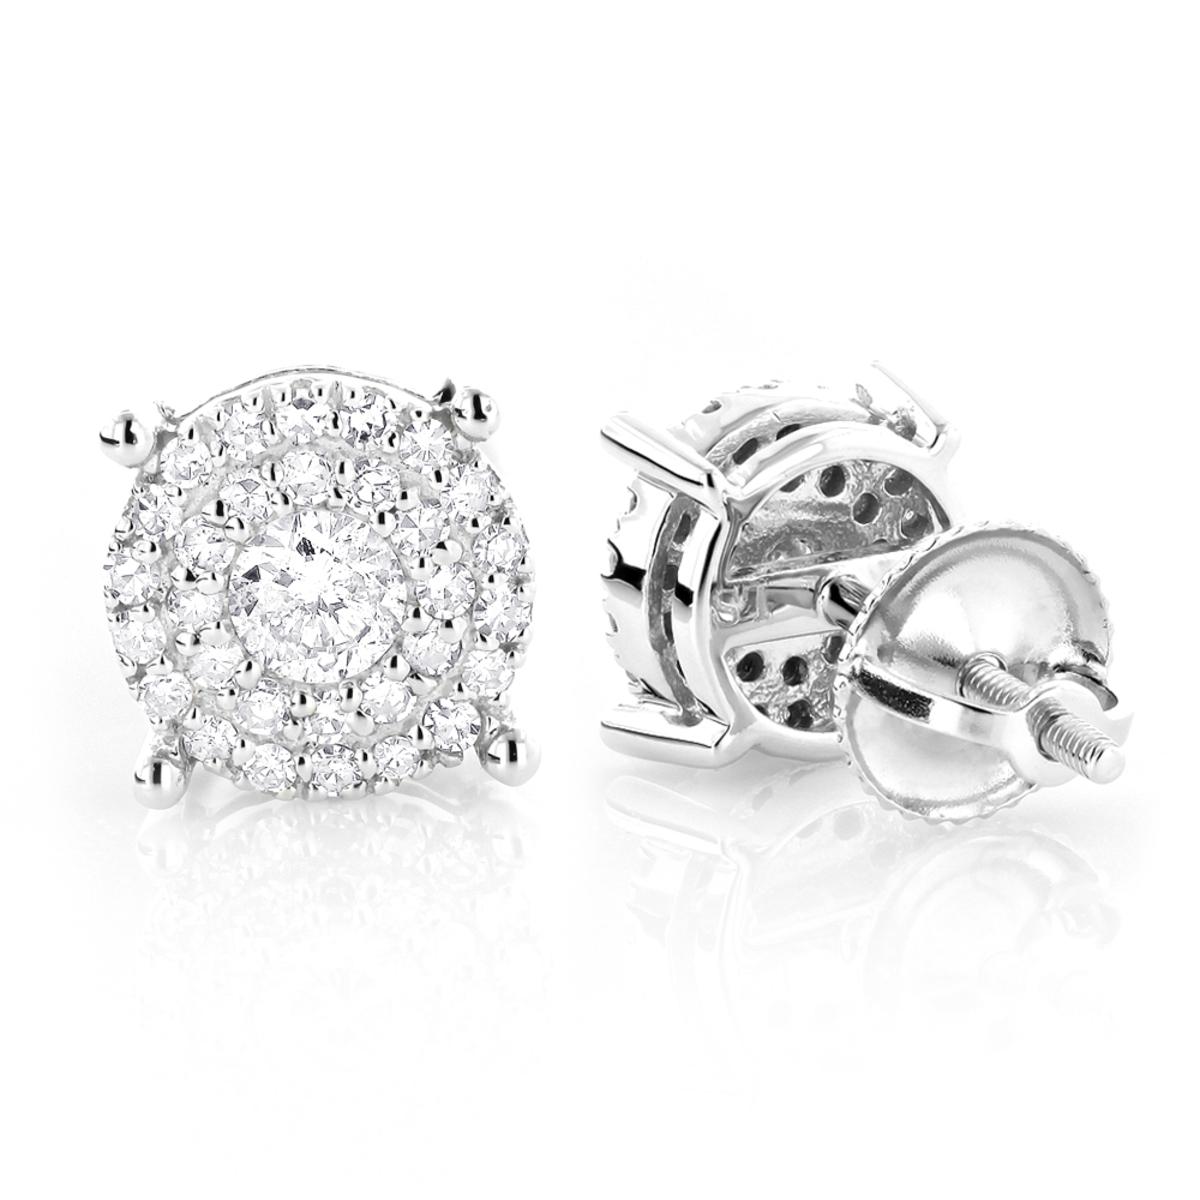 Round Diamond Stud Earrings 0.6ct 14K Gold